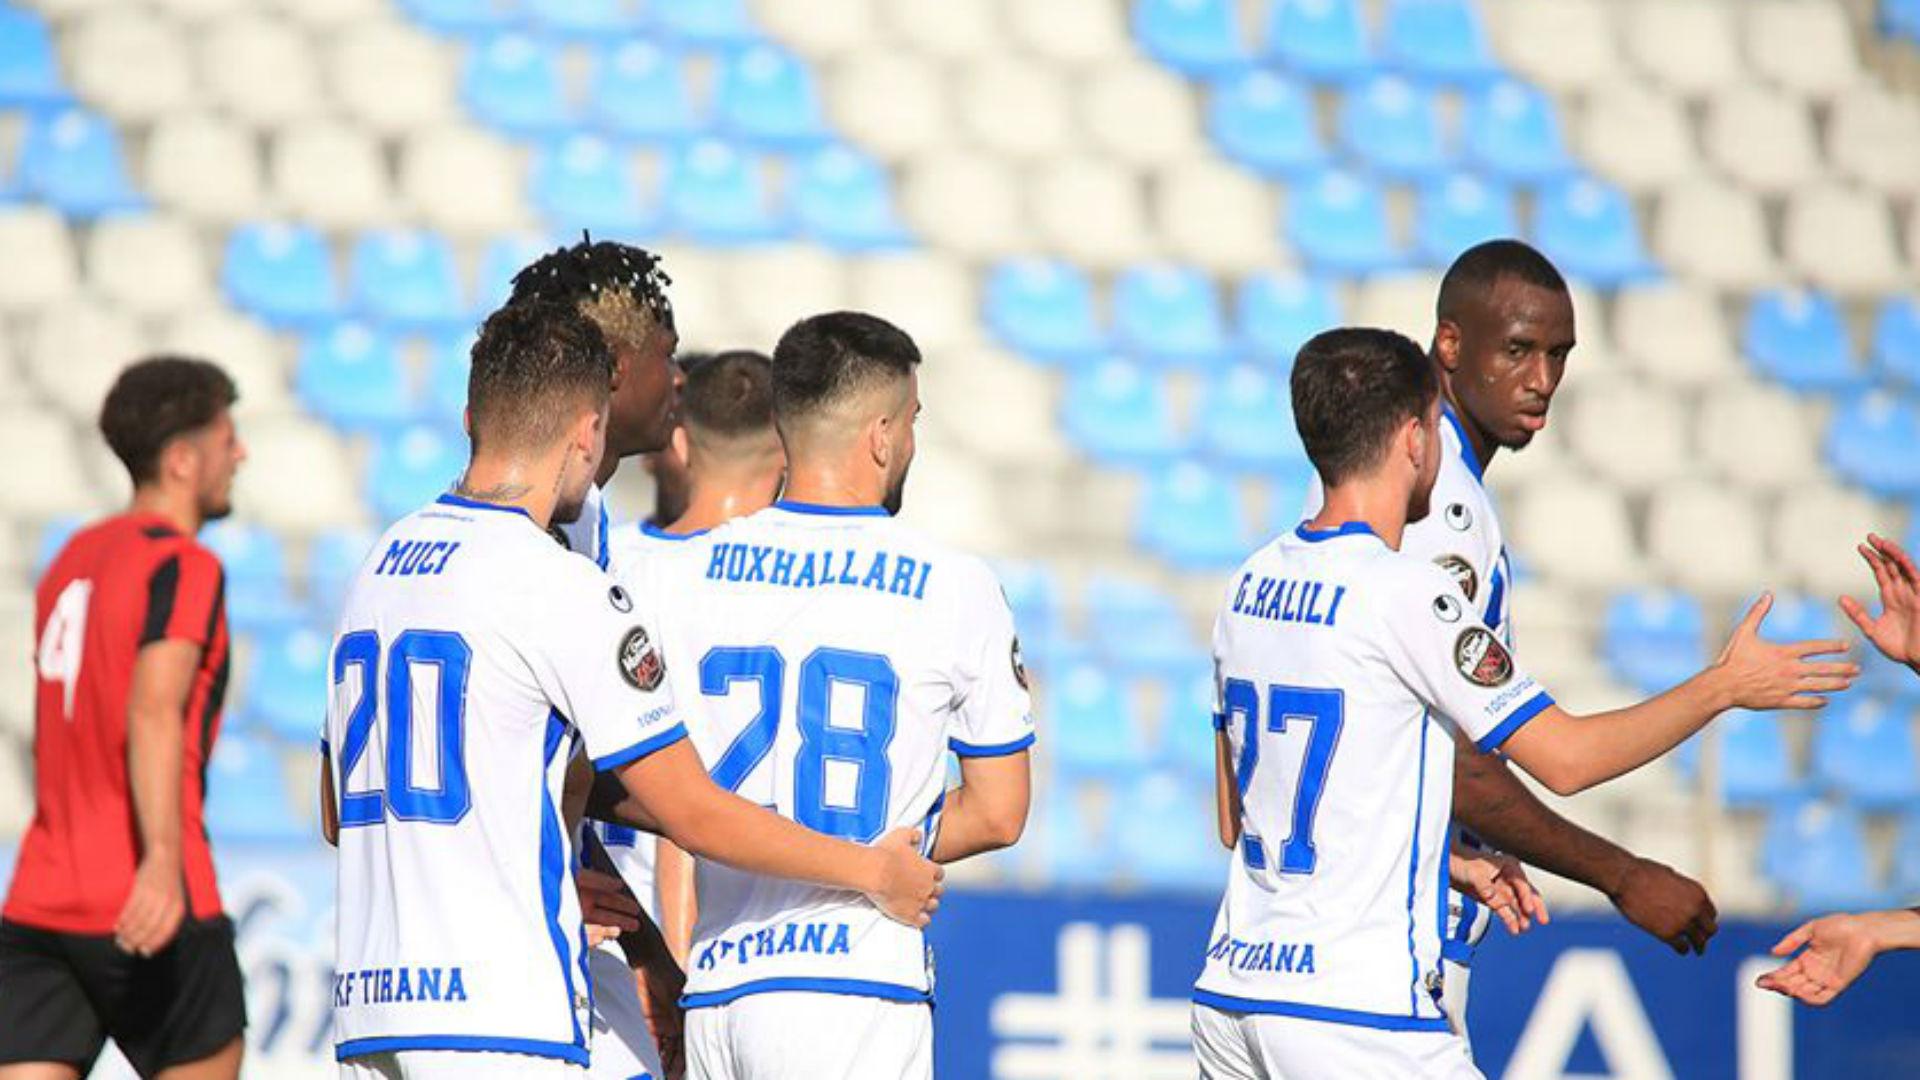 Dunga to miss Vllaznia Shkoder vs Partizani Tirana showdown due to permit issues